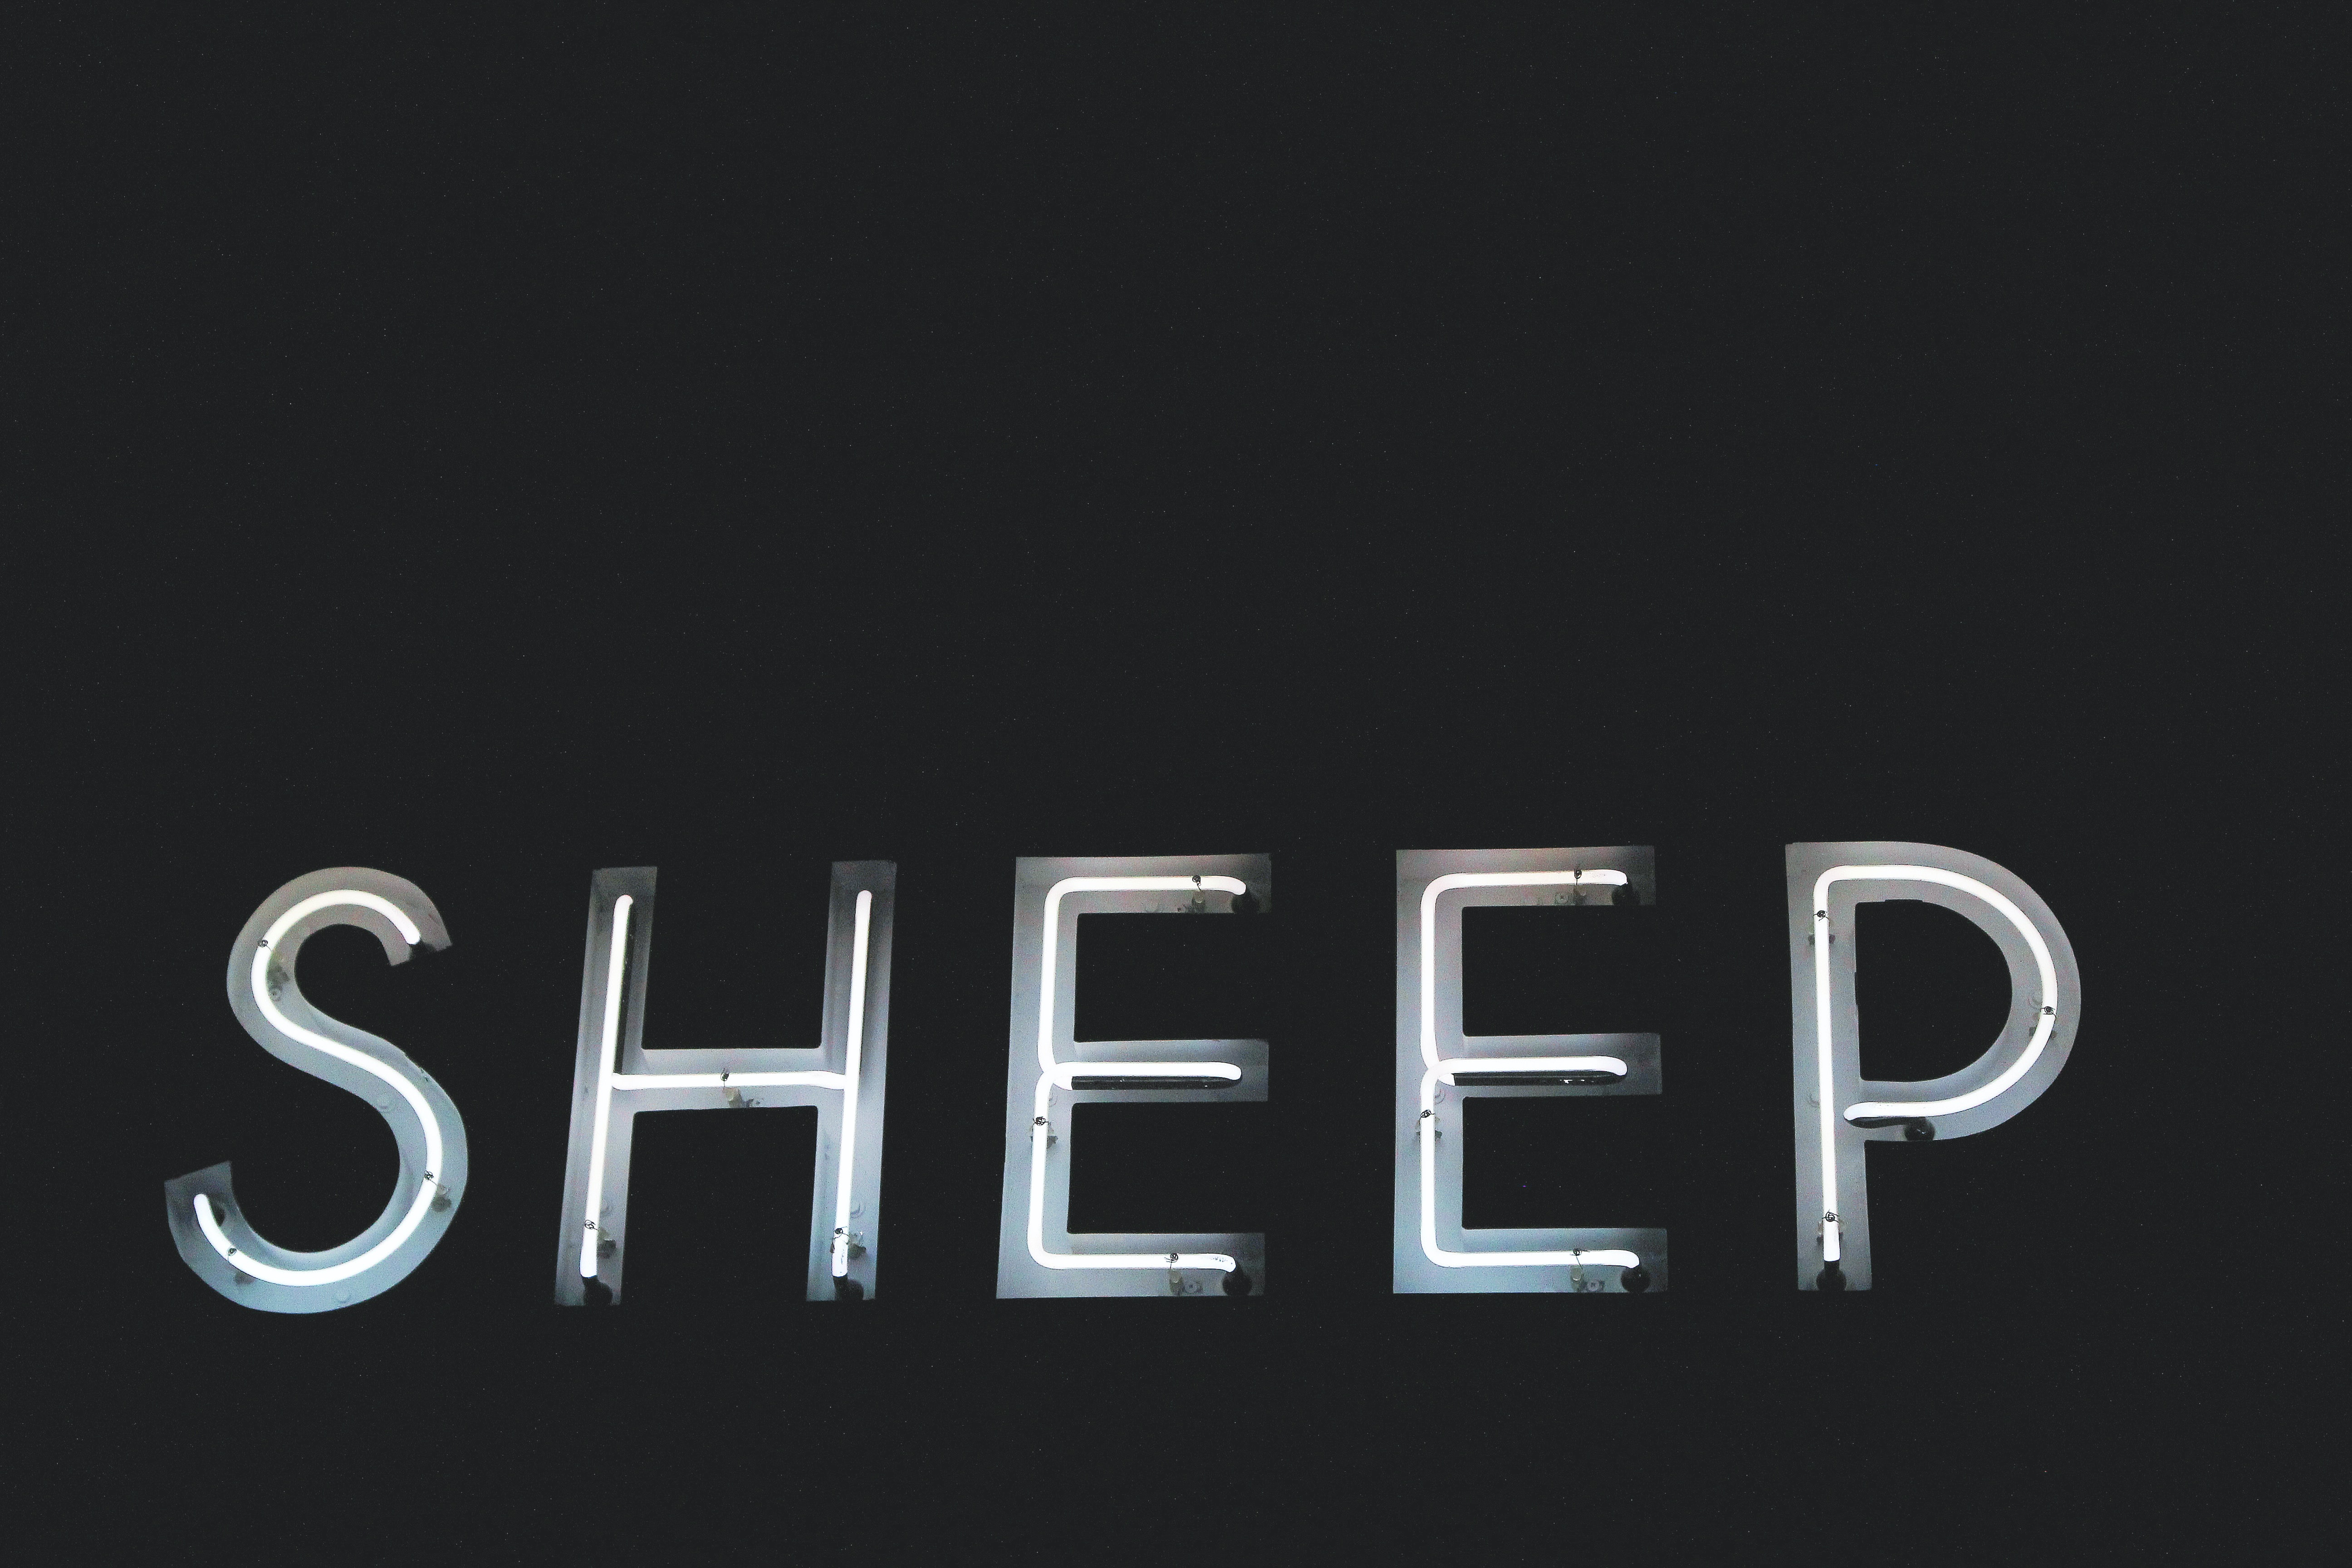 sheep neon light signage